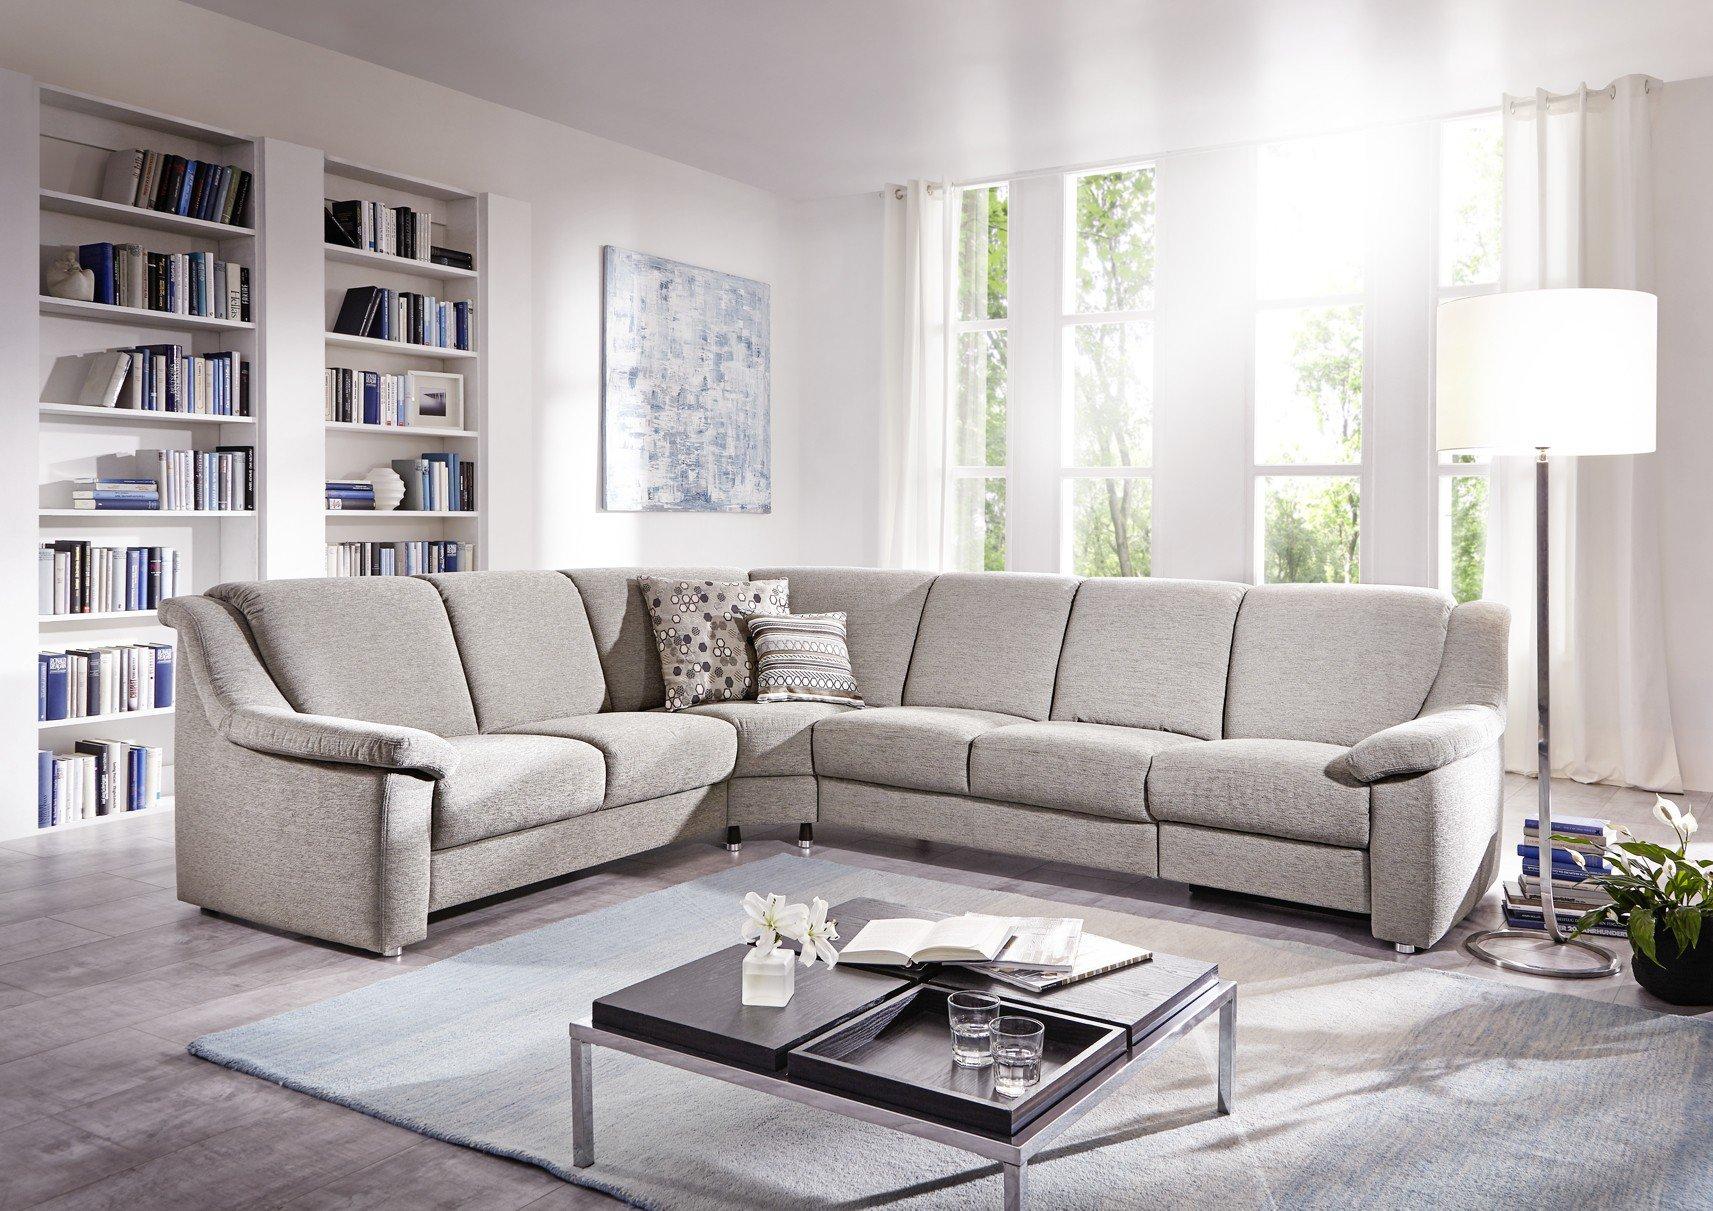 gruber polsterm bel genesis ecksofa in grau m bel letz ihr online shop. Black Bedroom Furniture Sets. Home Design Ideas